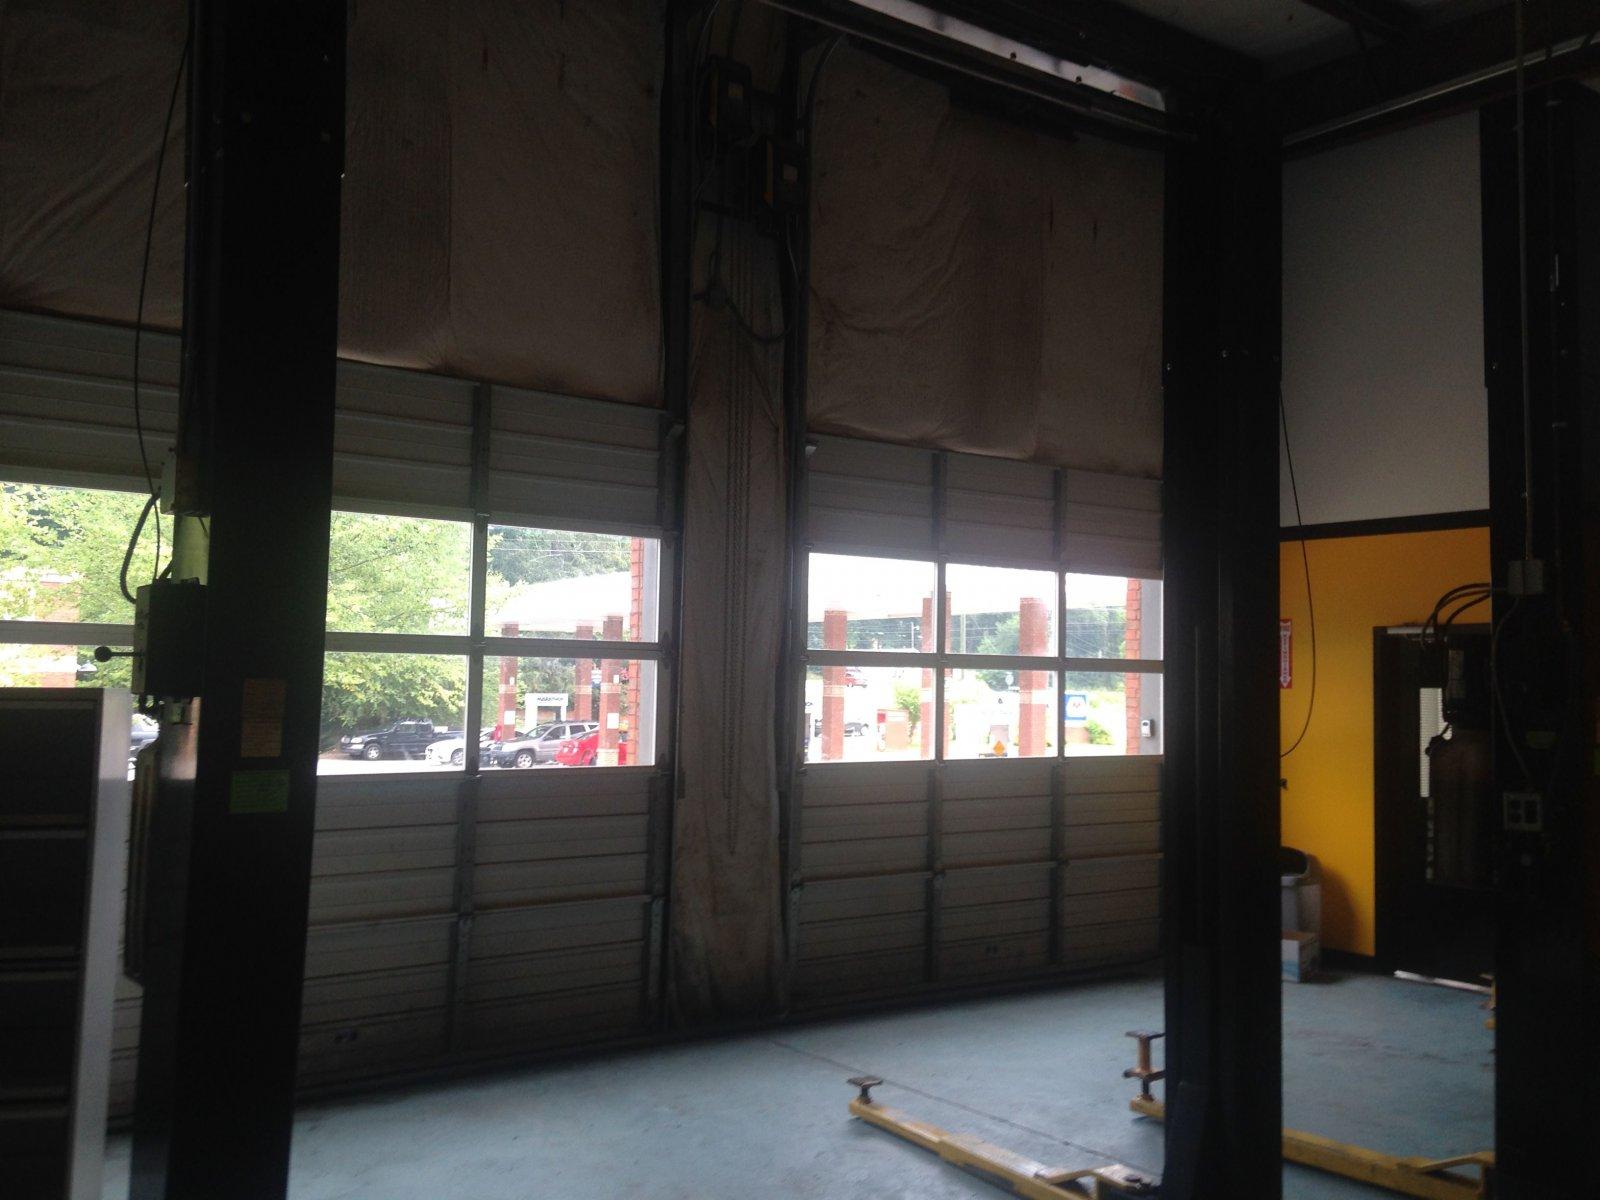 canton ga auto repair shop garage doors